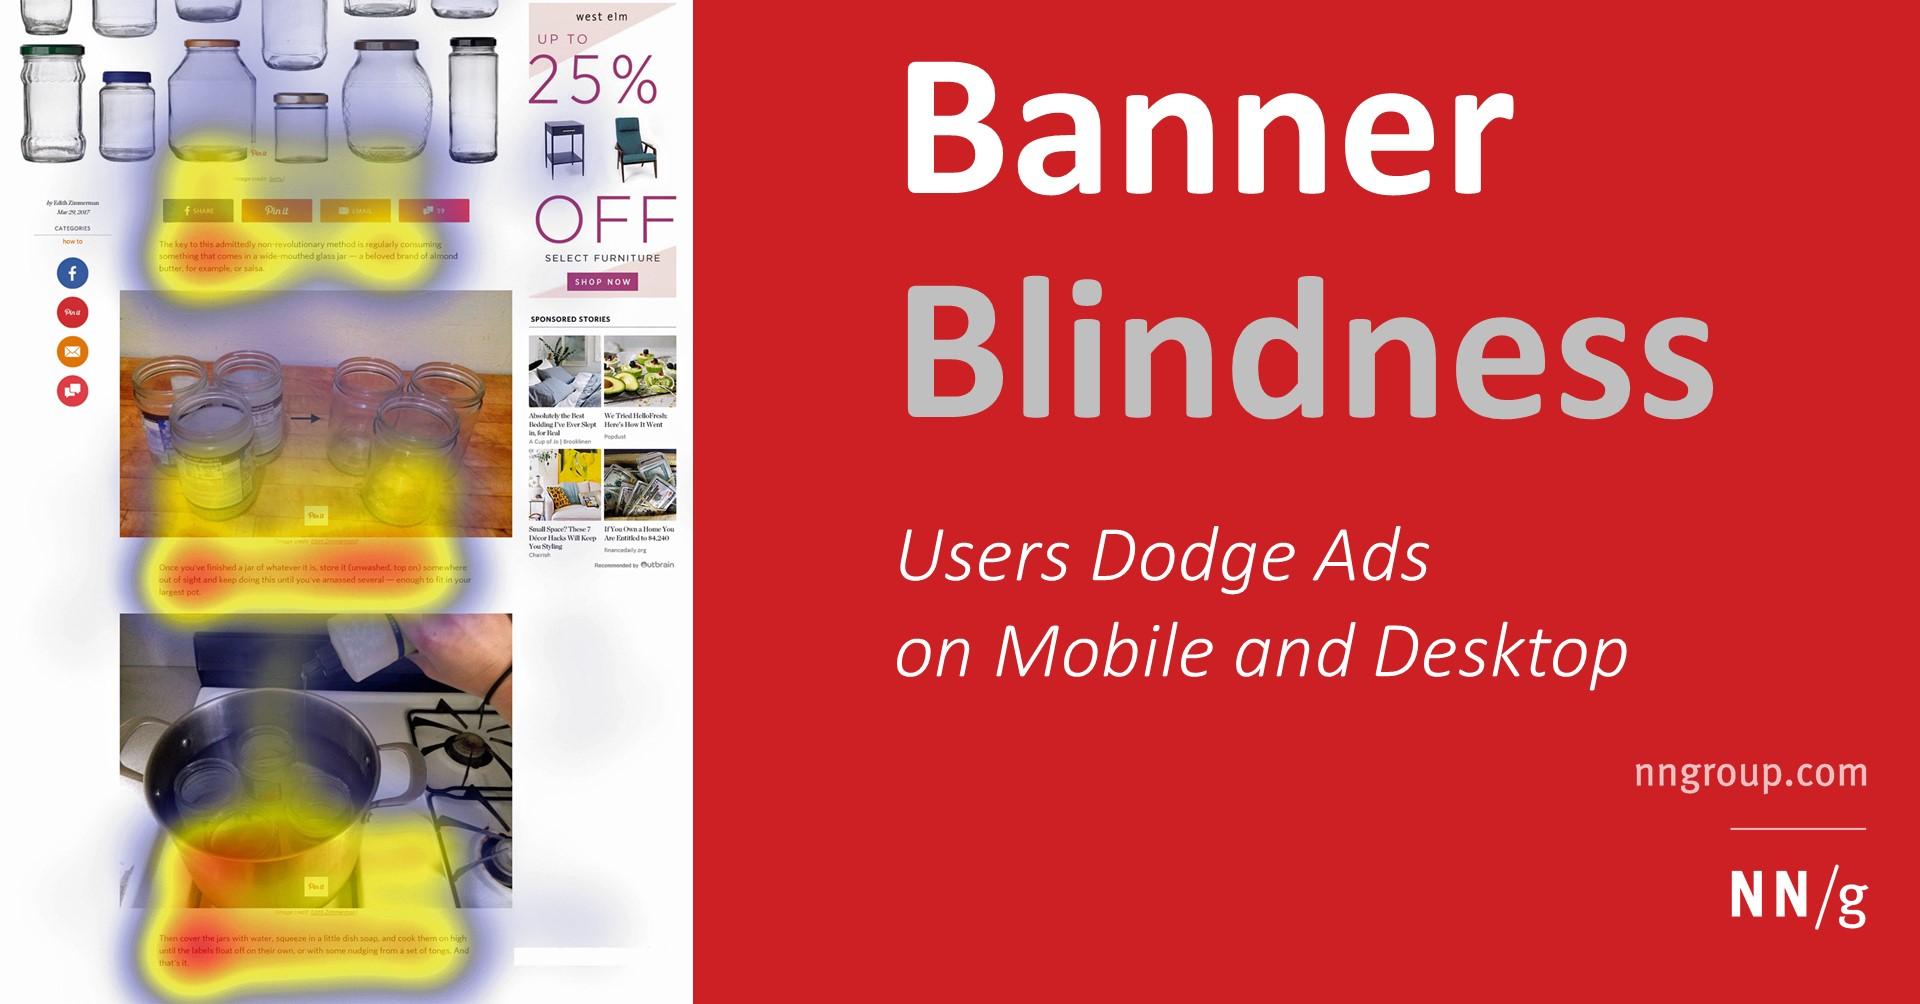 Banner Blindness Revisited: Users Dodge Ads on Mobile and Desktop